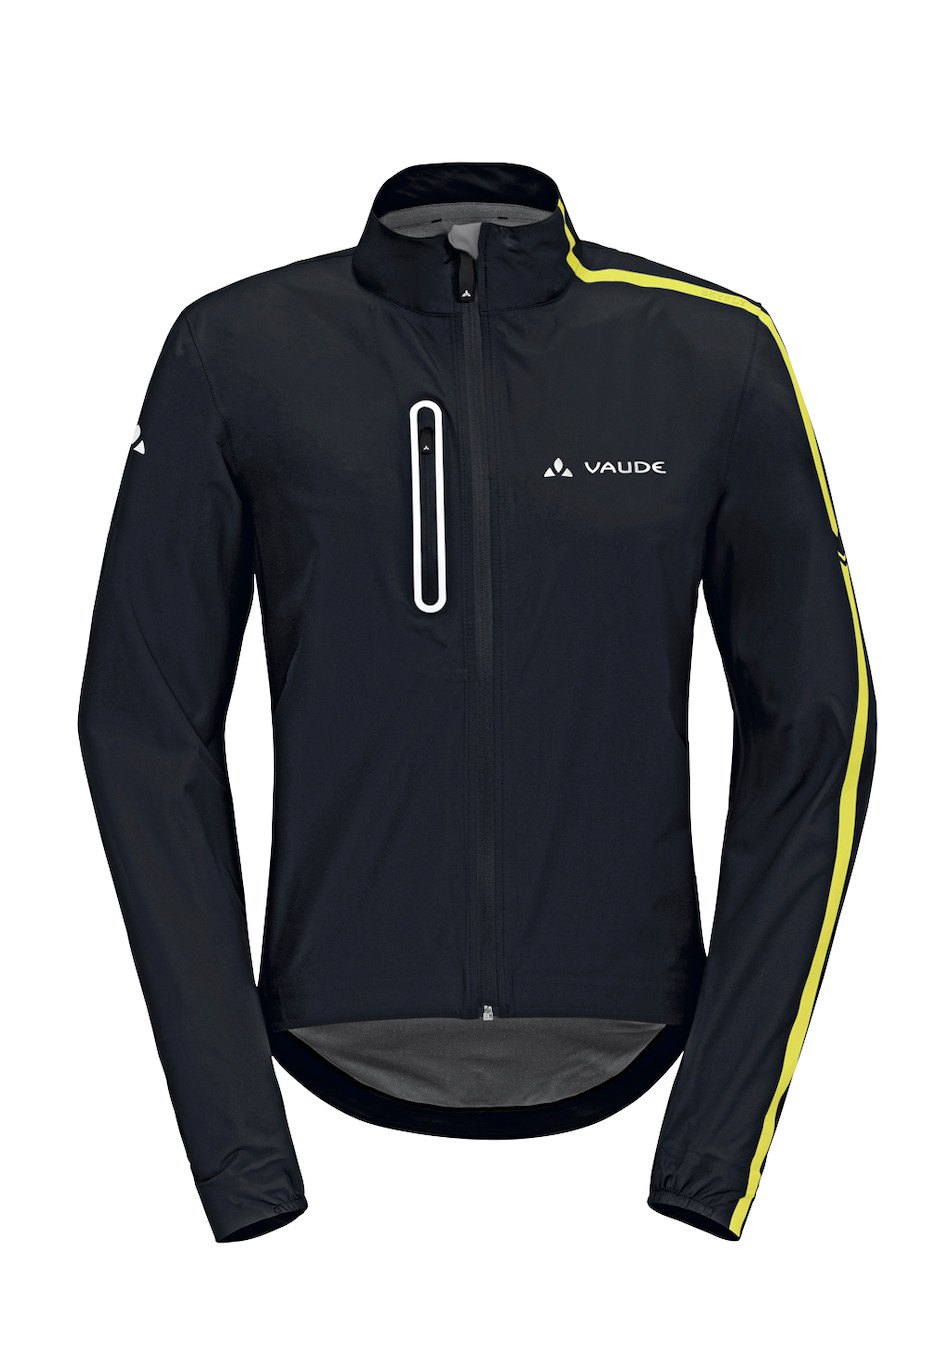 cd7521465 Vaude Sky Fly Emergency Waterproof Cycling Jacket | On - One